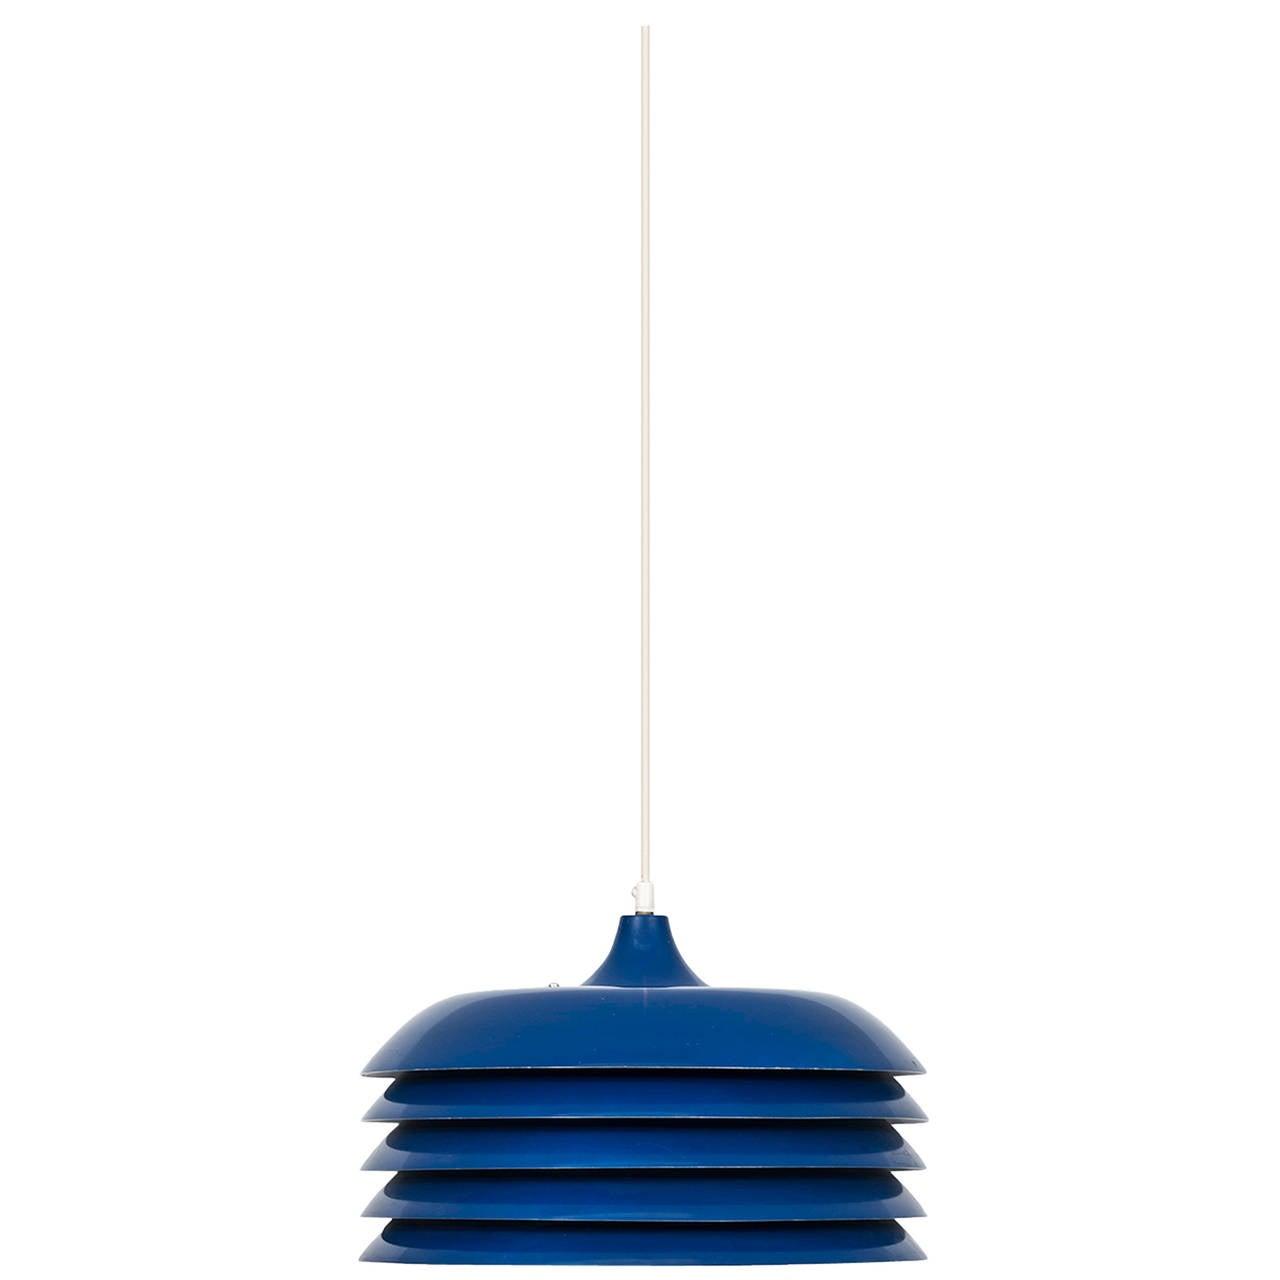 Hans-Agne Jakobsson Ceiling Lamp by Hans-Agne Jakobsson in Markaryd, Sweden